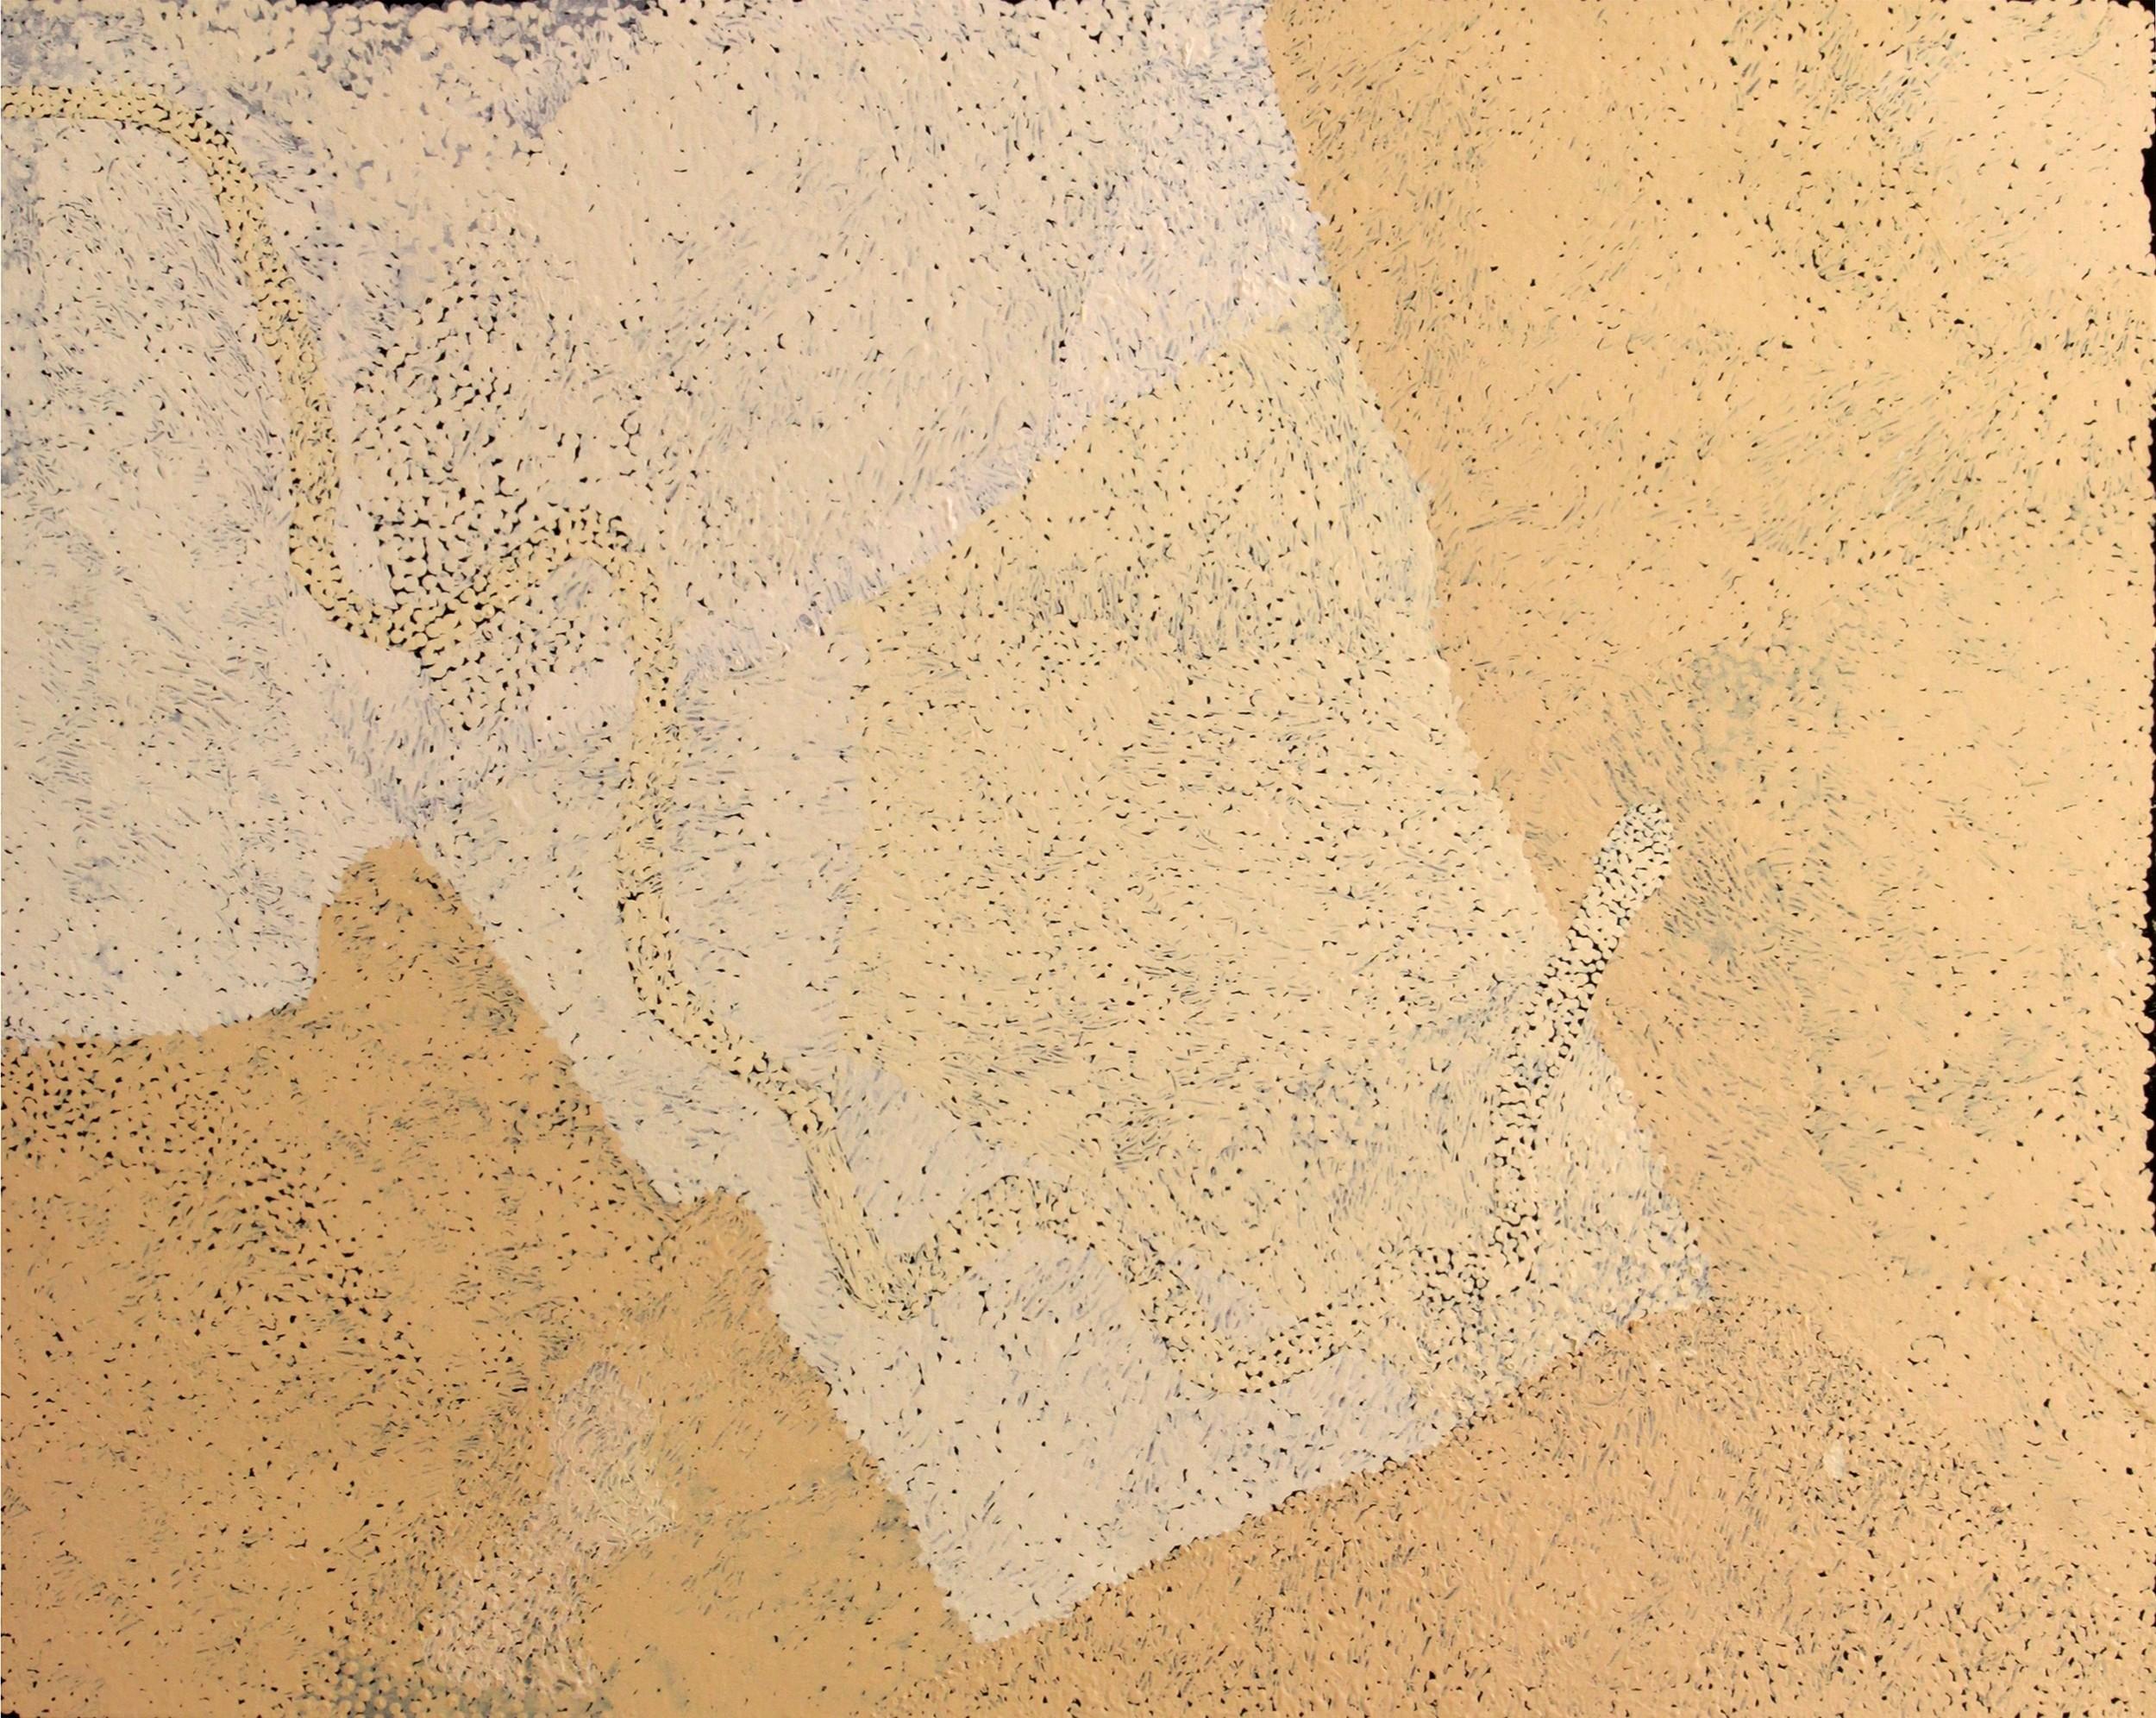 "Pepai Jangala Carroll  Walungurru  Acrylic on linen 31.5"" x 39"" (80 x 100 cm) Ernabella Arts Catalog #491-15   SOLD"